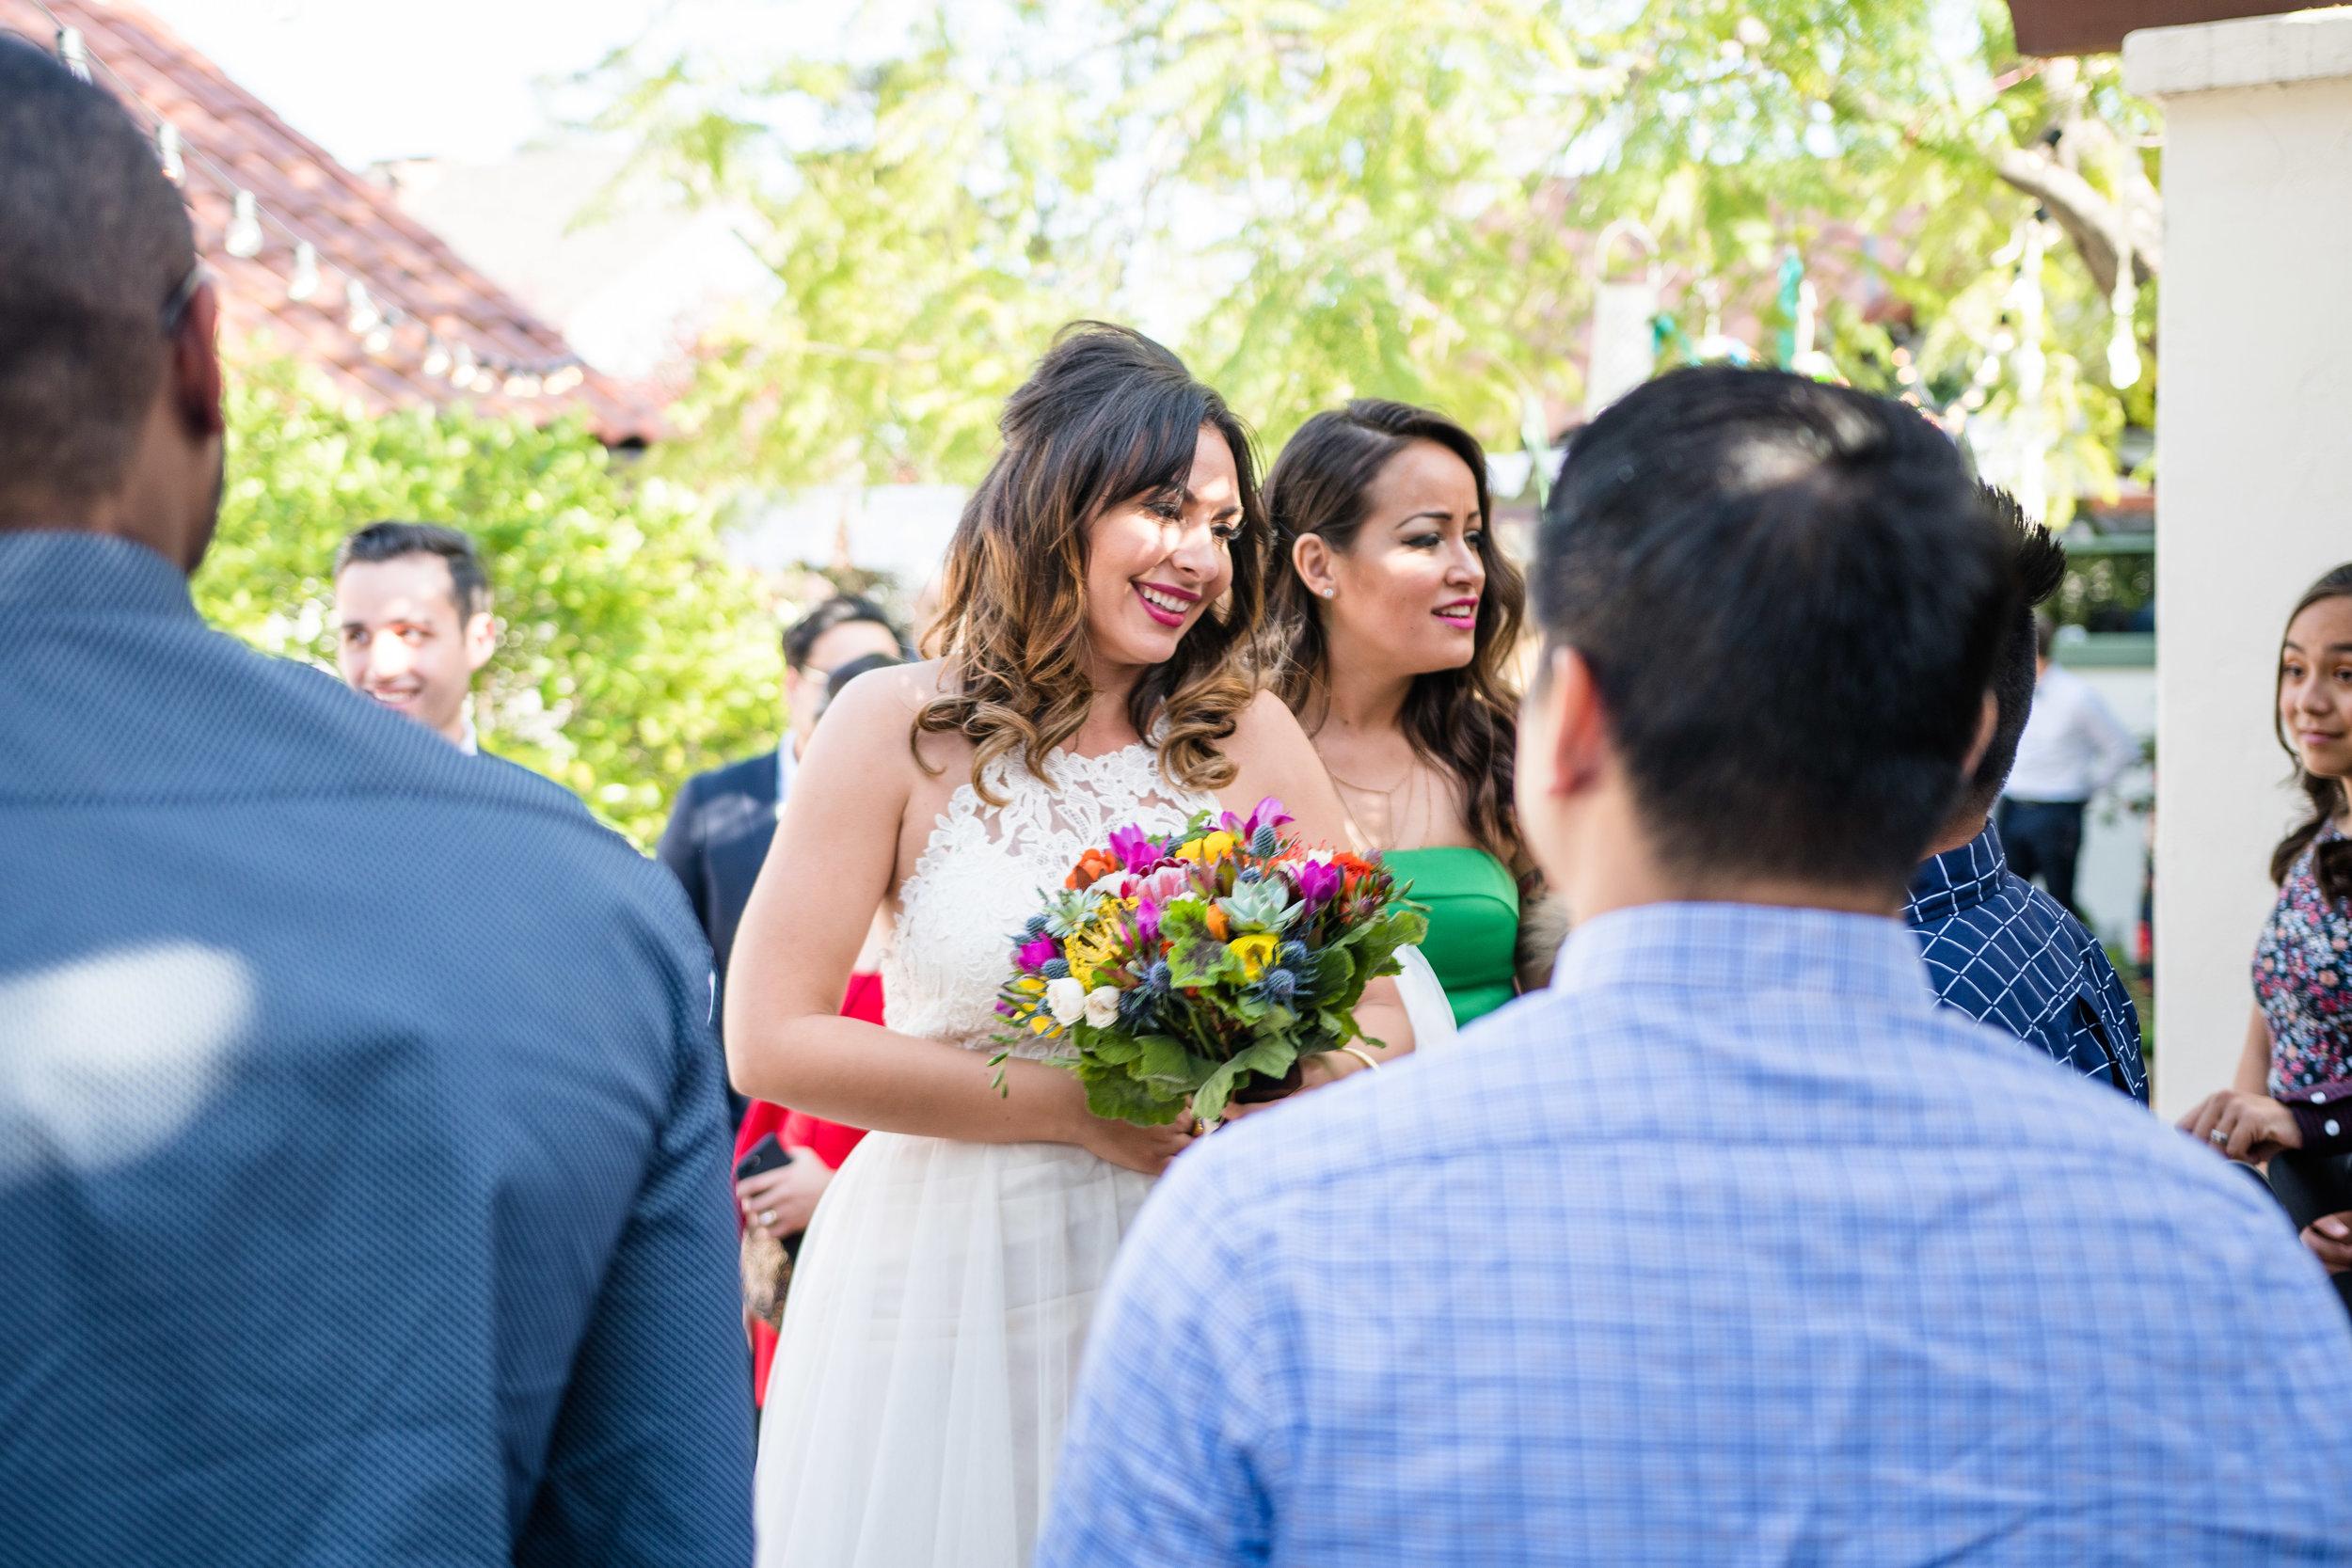 Vibrant Fiesta Backyard Wedding Reception bride carrying bouquet greeting guests.jpg